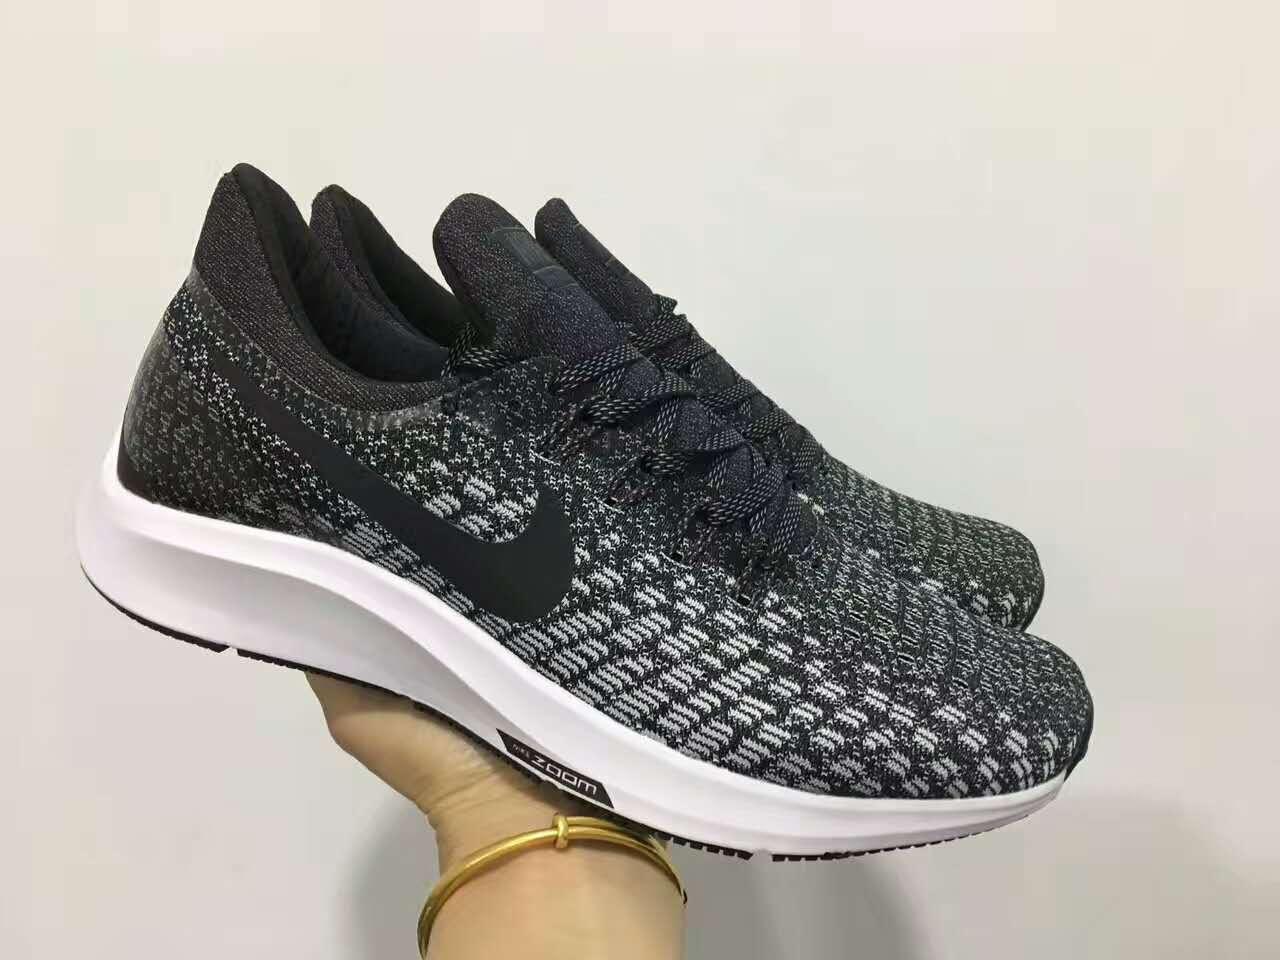 d4cbeb4ff01b3 Nike Air Zoom Pegasus 35 Flyknit Silver Black Shoes  18running22801 ...